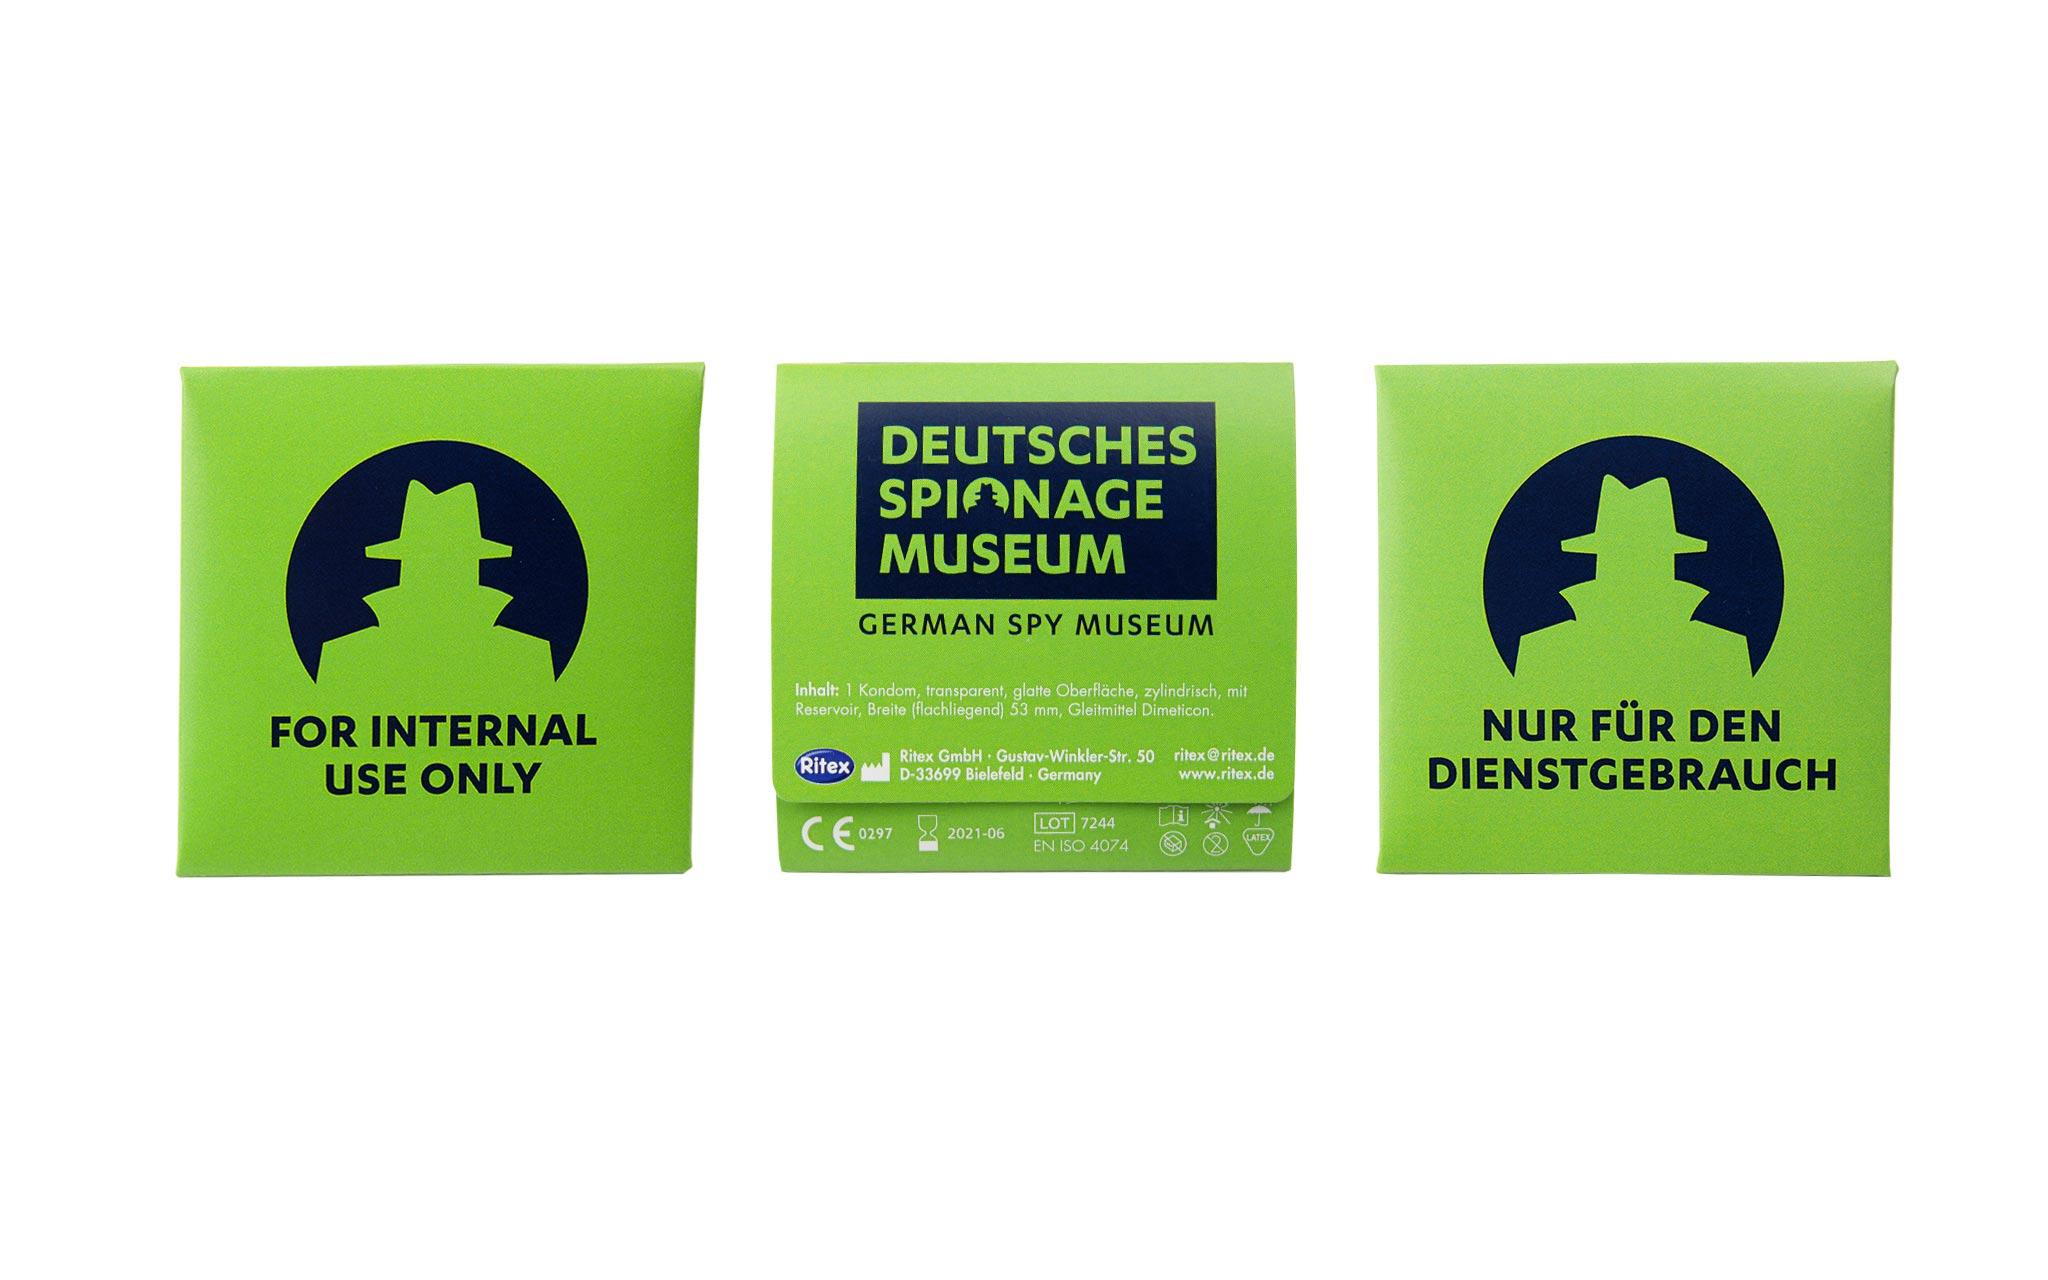 spionagemuseum-mediarock-kondome